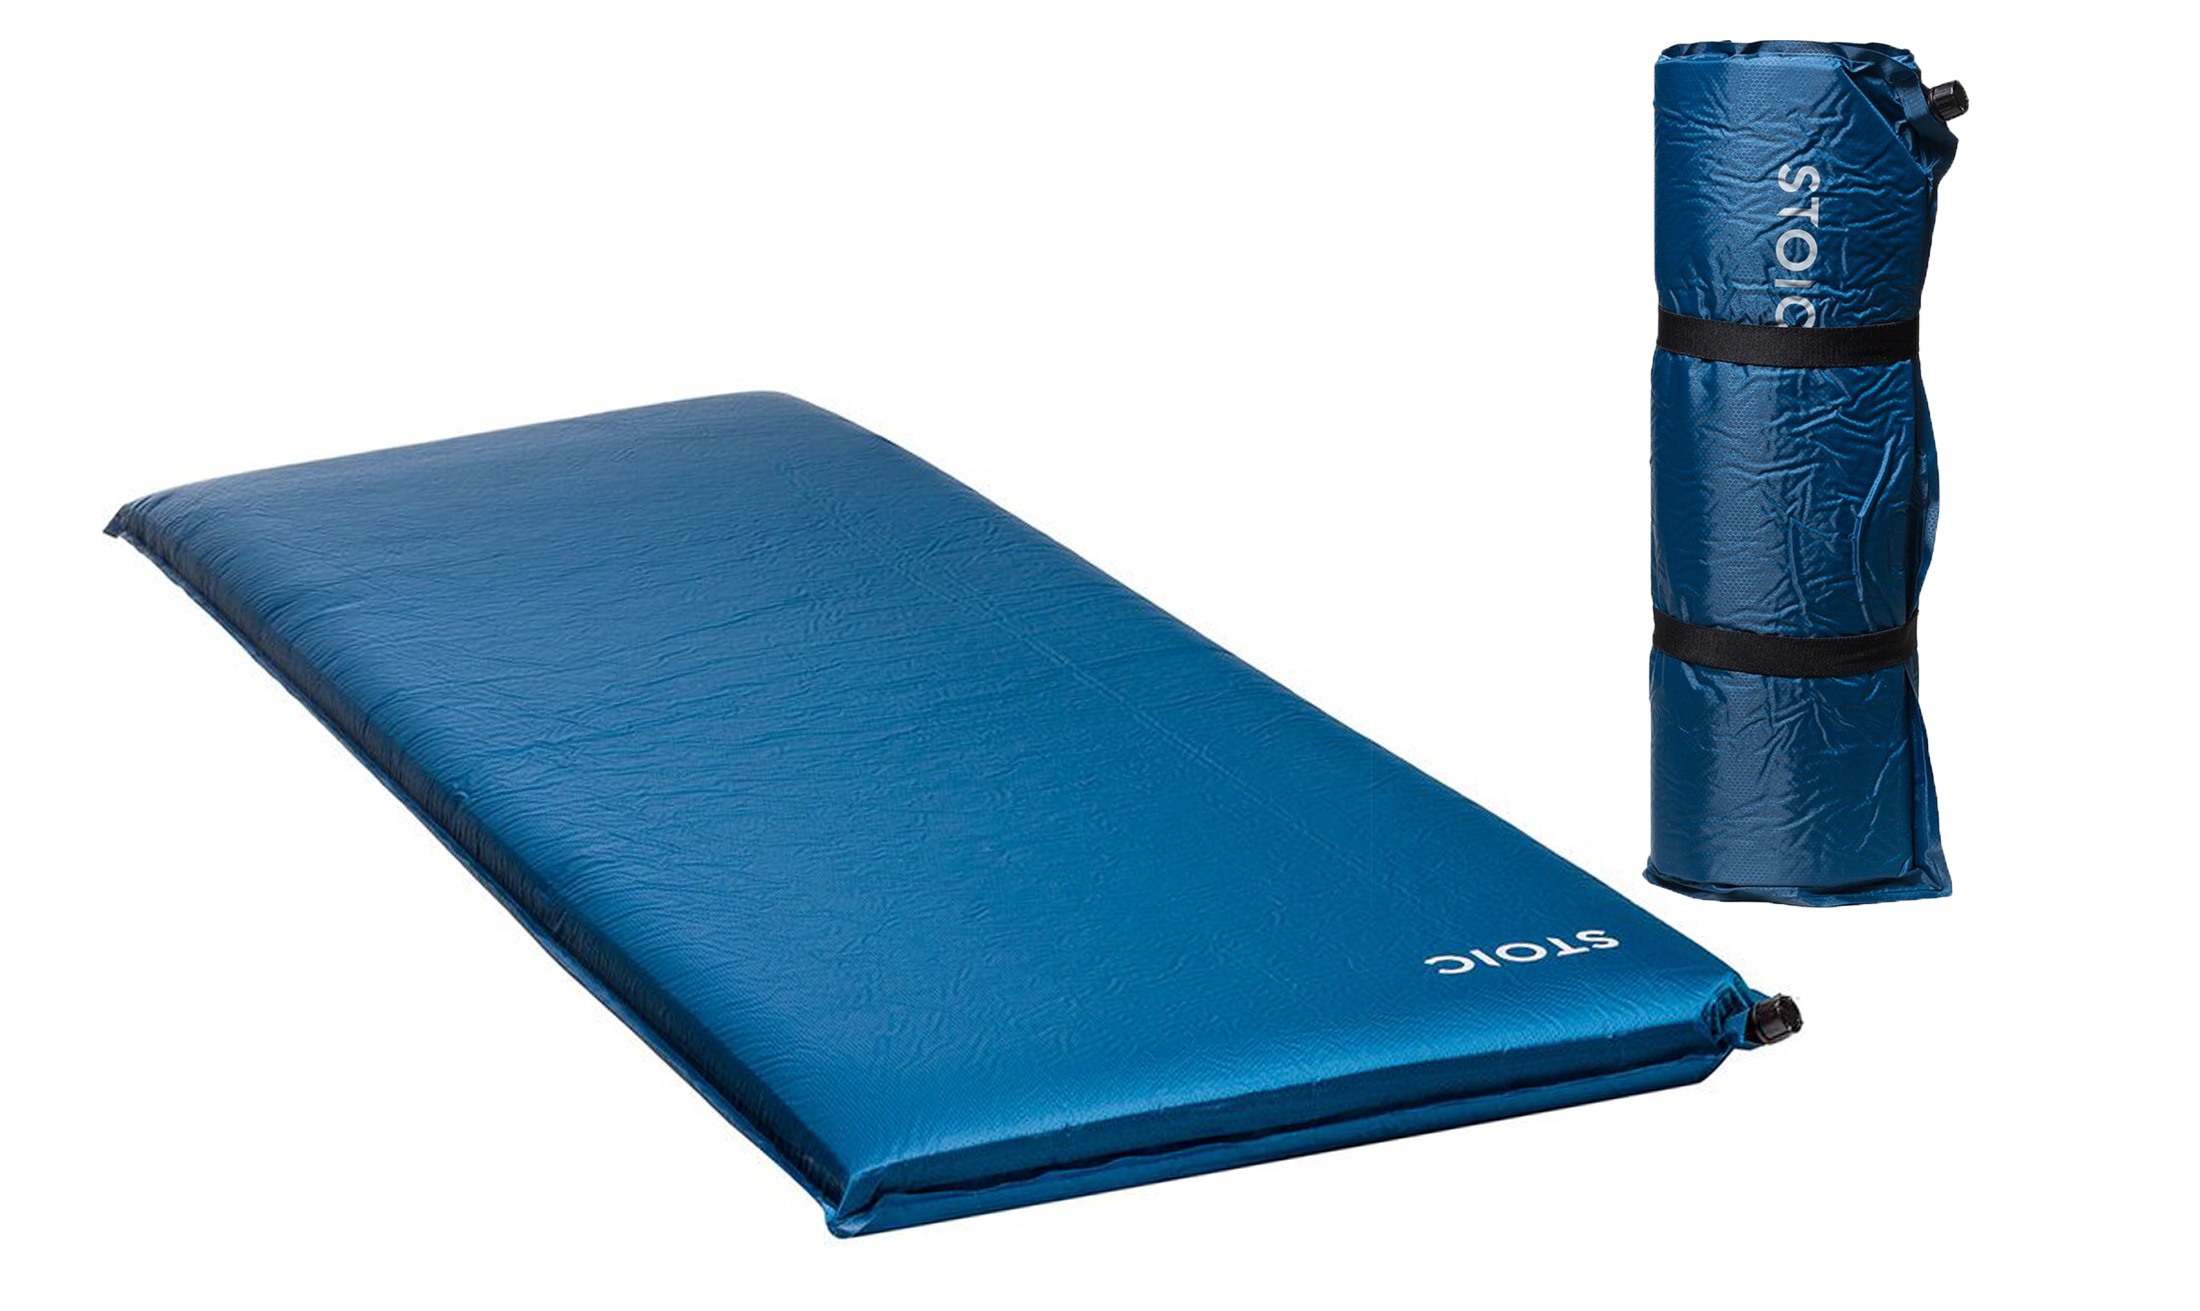 stoic sleeping pad